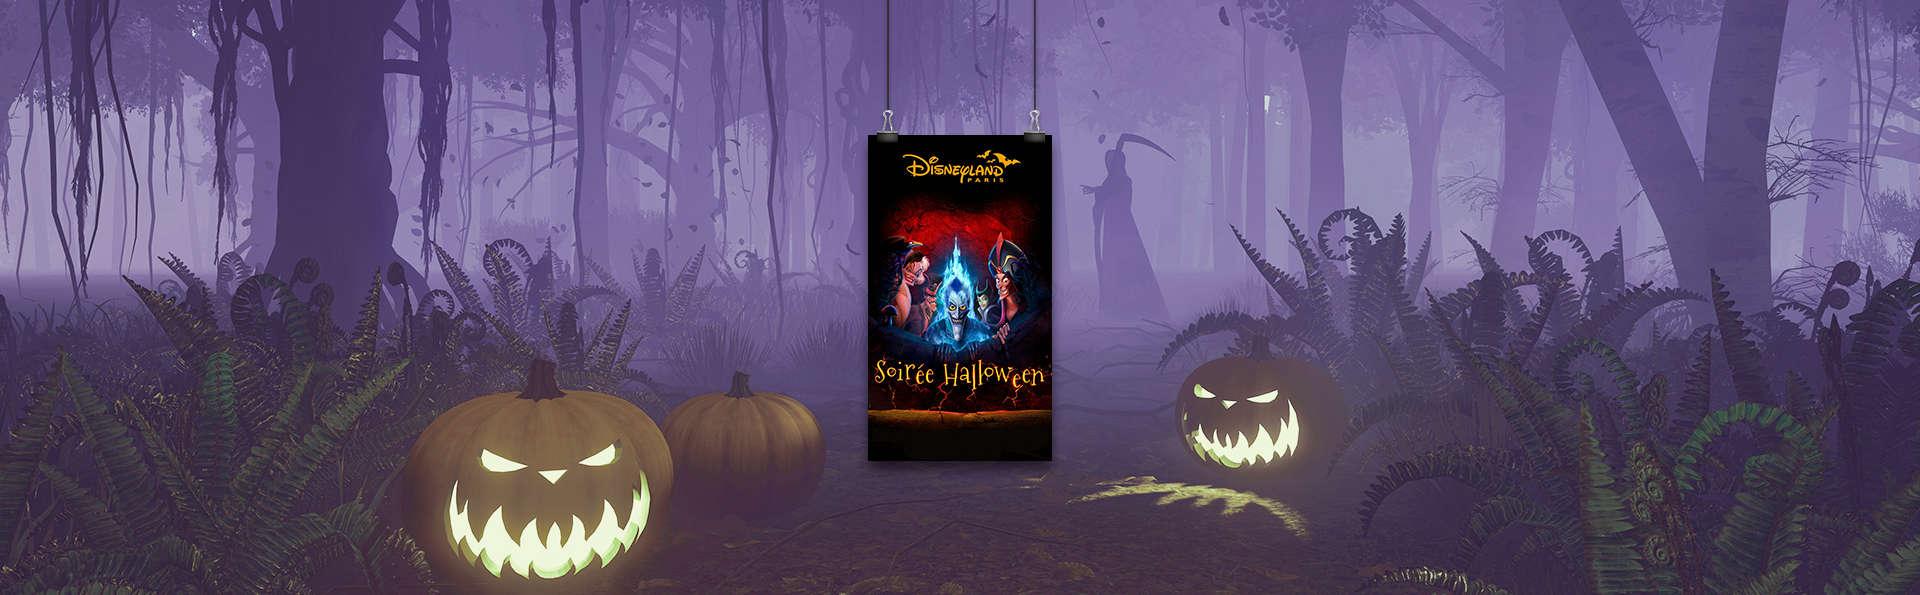 31 Oktober Halloween Feest.Weekend In Een Attractie Of Dierenpark Torcy Met 1 Toegang